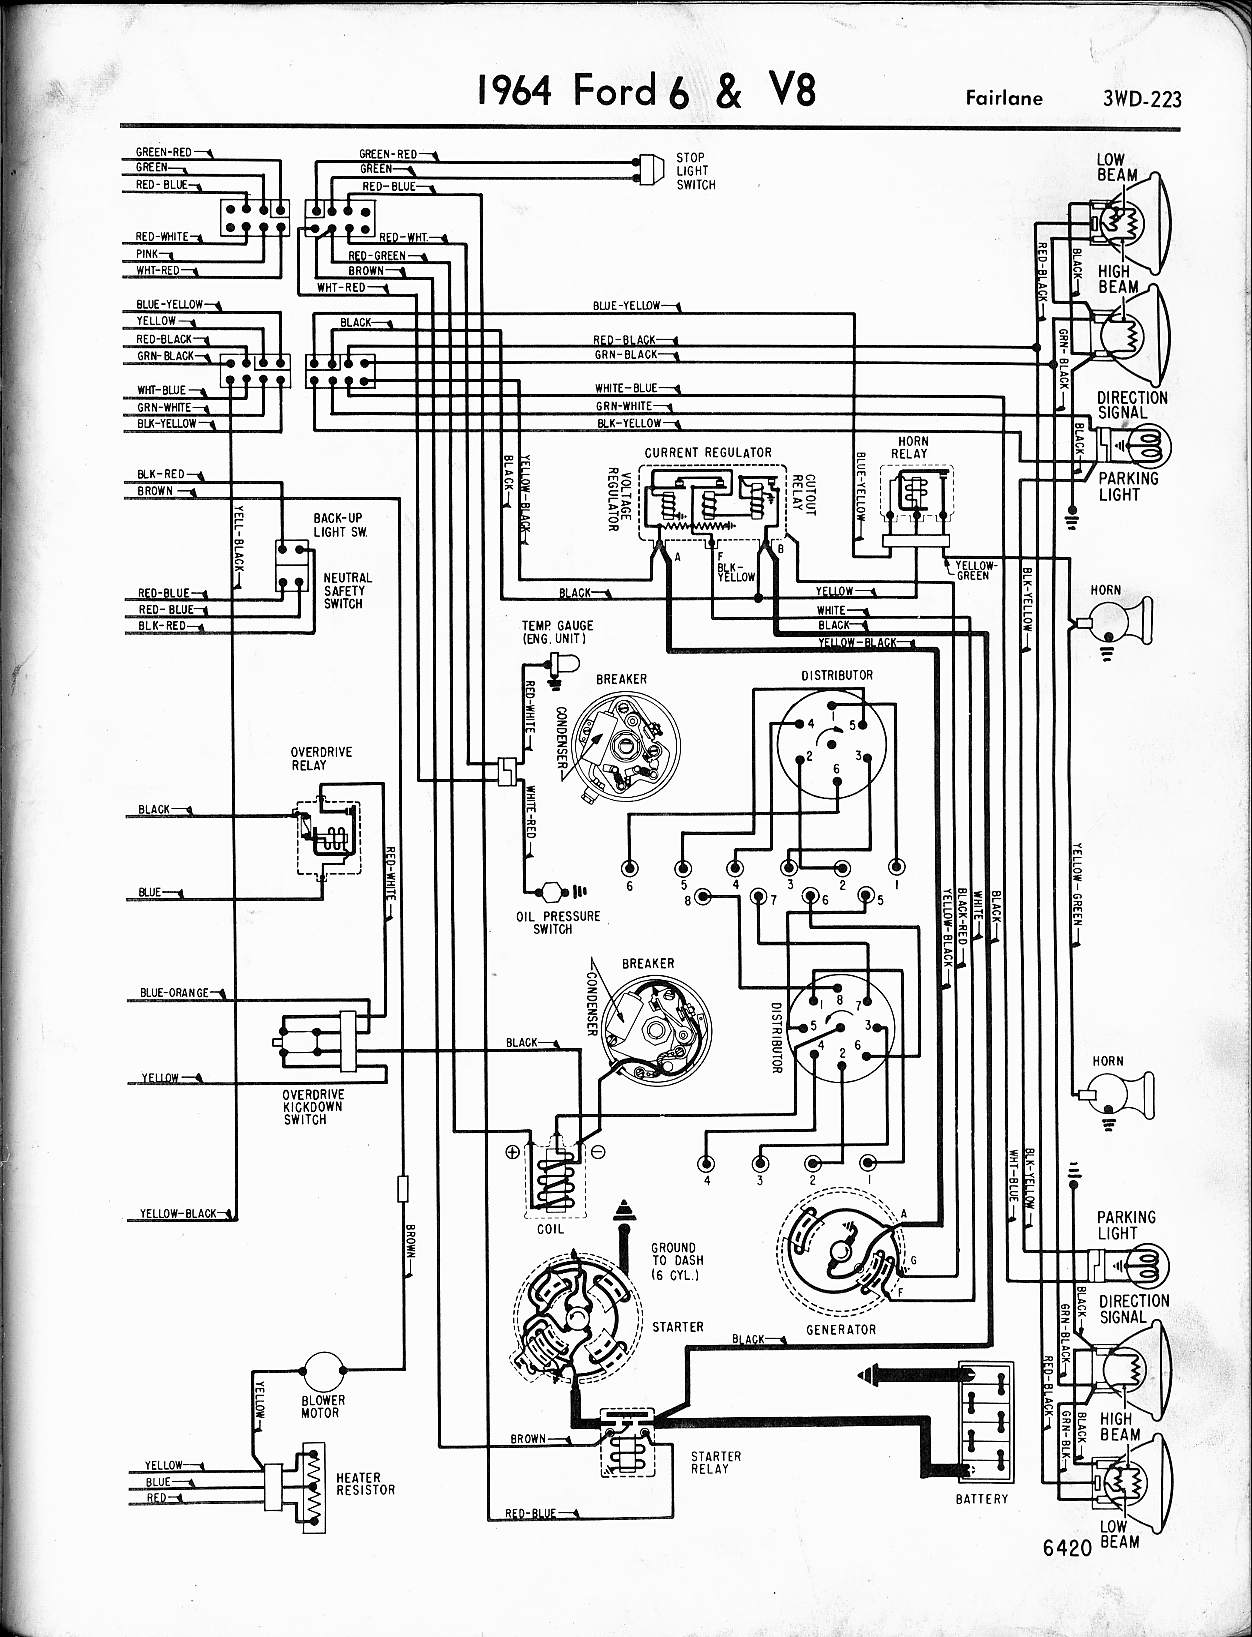 1967 ford thunderbird wiring diagram ob 5628  ford f100 wiring diagram for a truck car electrical  ob 5628  ford f100 wiring diagram for a